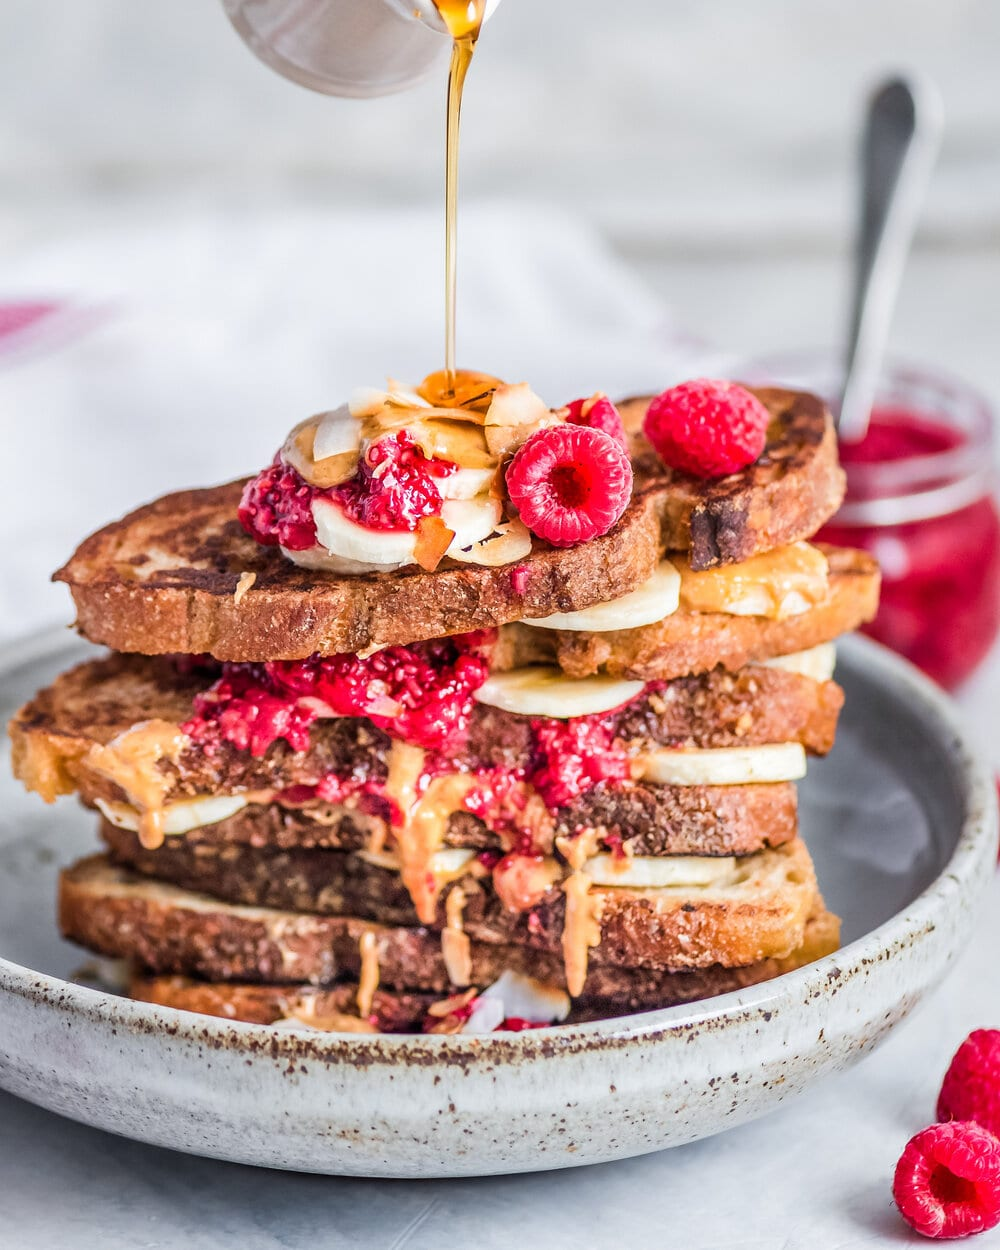 Peanut Butter and Jelly Banana French Toast (Vegan)